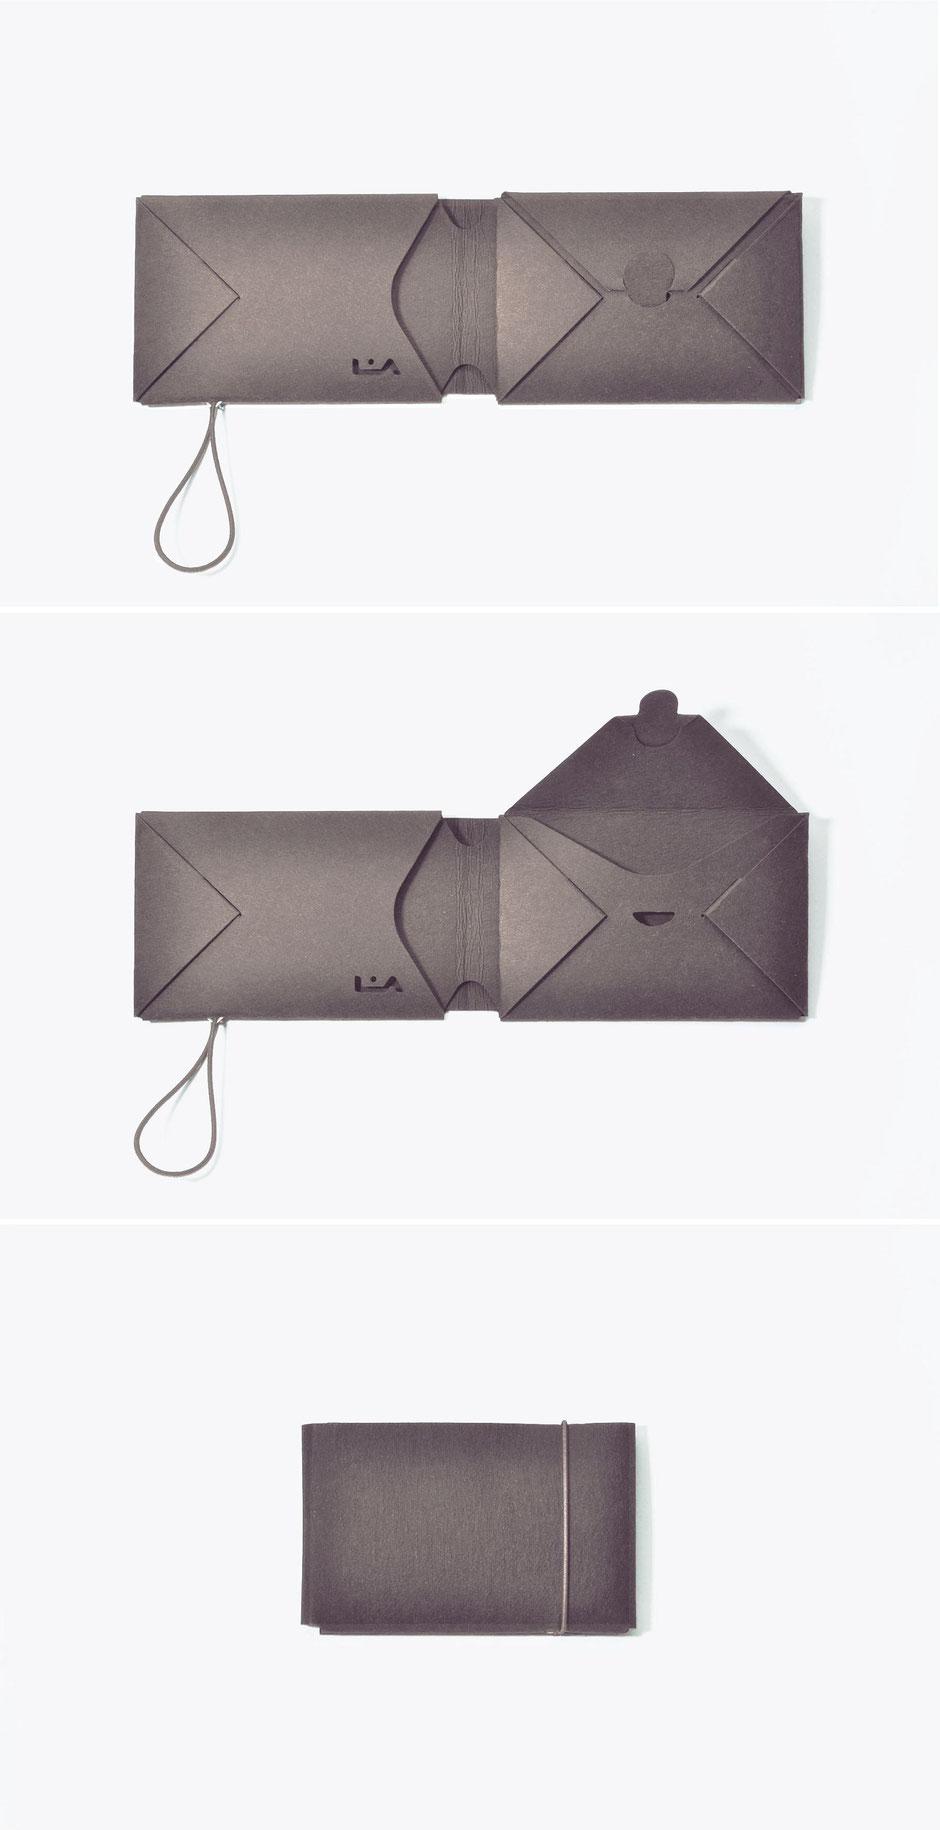 liaform Portemonnaie LUDWIG braun/uni | Vegane Mini Origami Geldbörse | vegan mini oriami purse/wallet | Portefeuille Vegan Mini Origami